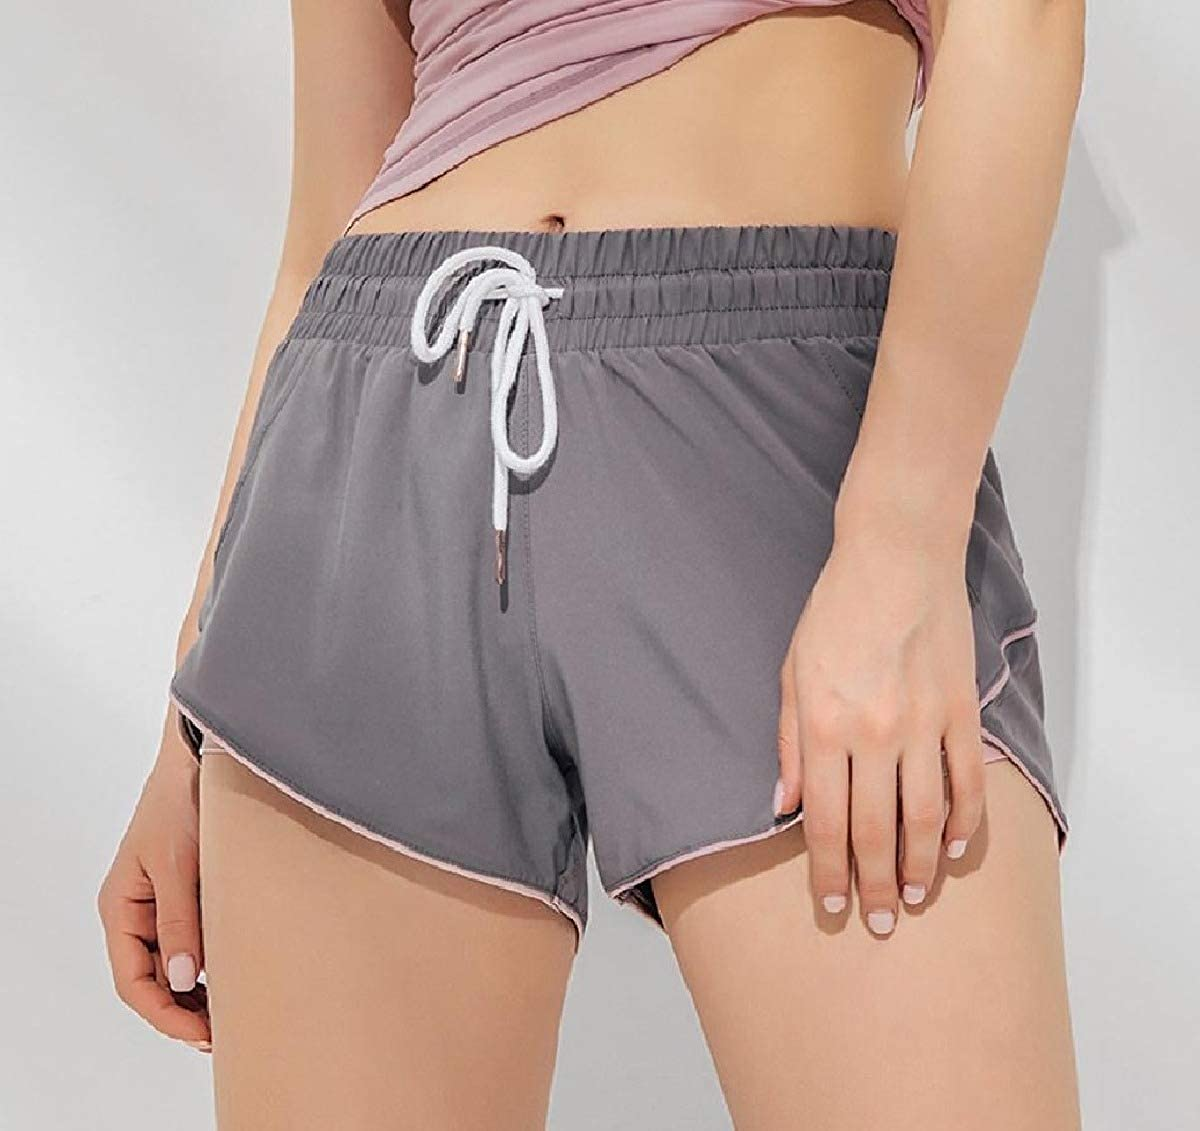 Zimaes-Women Quick Dry Gym Dance Yoga Pilates Color Conjoin Yoga Shorts